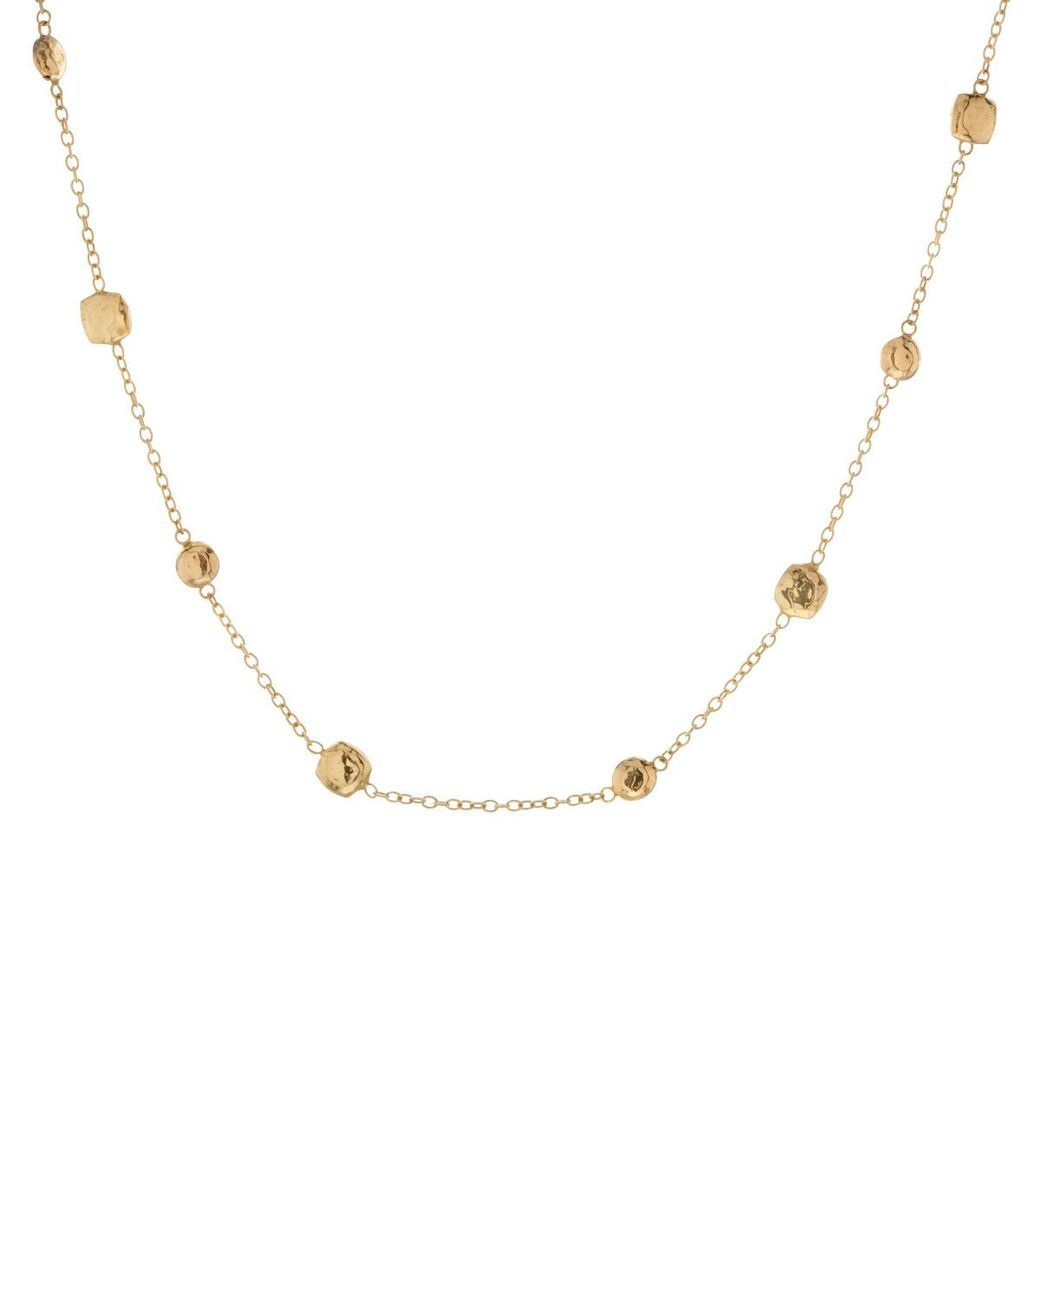 Ippolita Glamazon Gold-Station Necklace FpZzXlfhLb